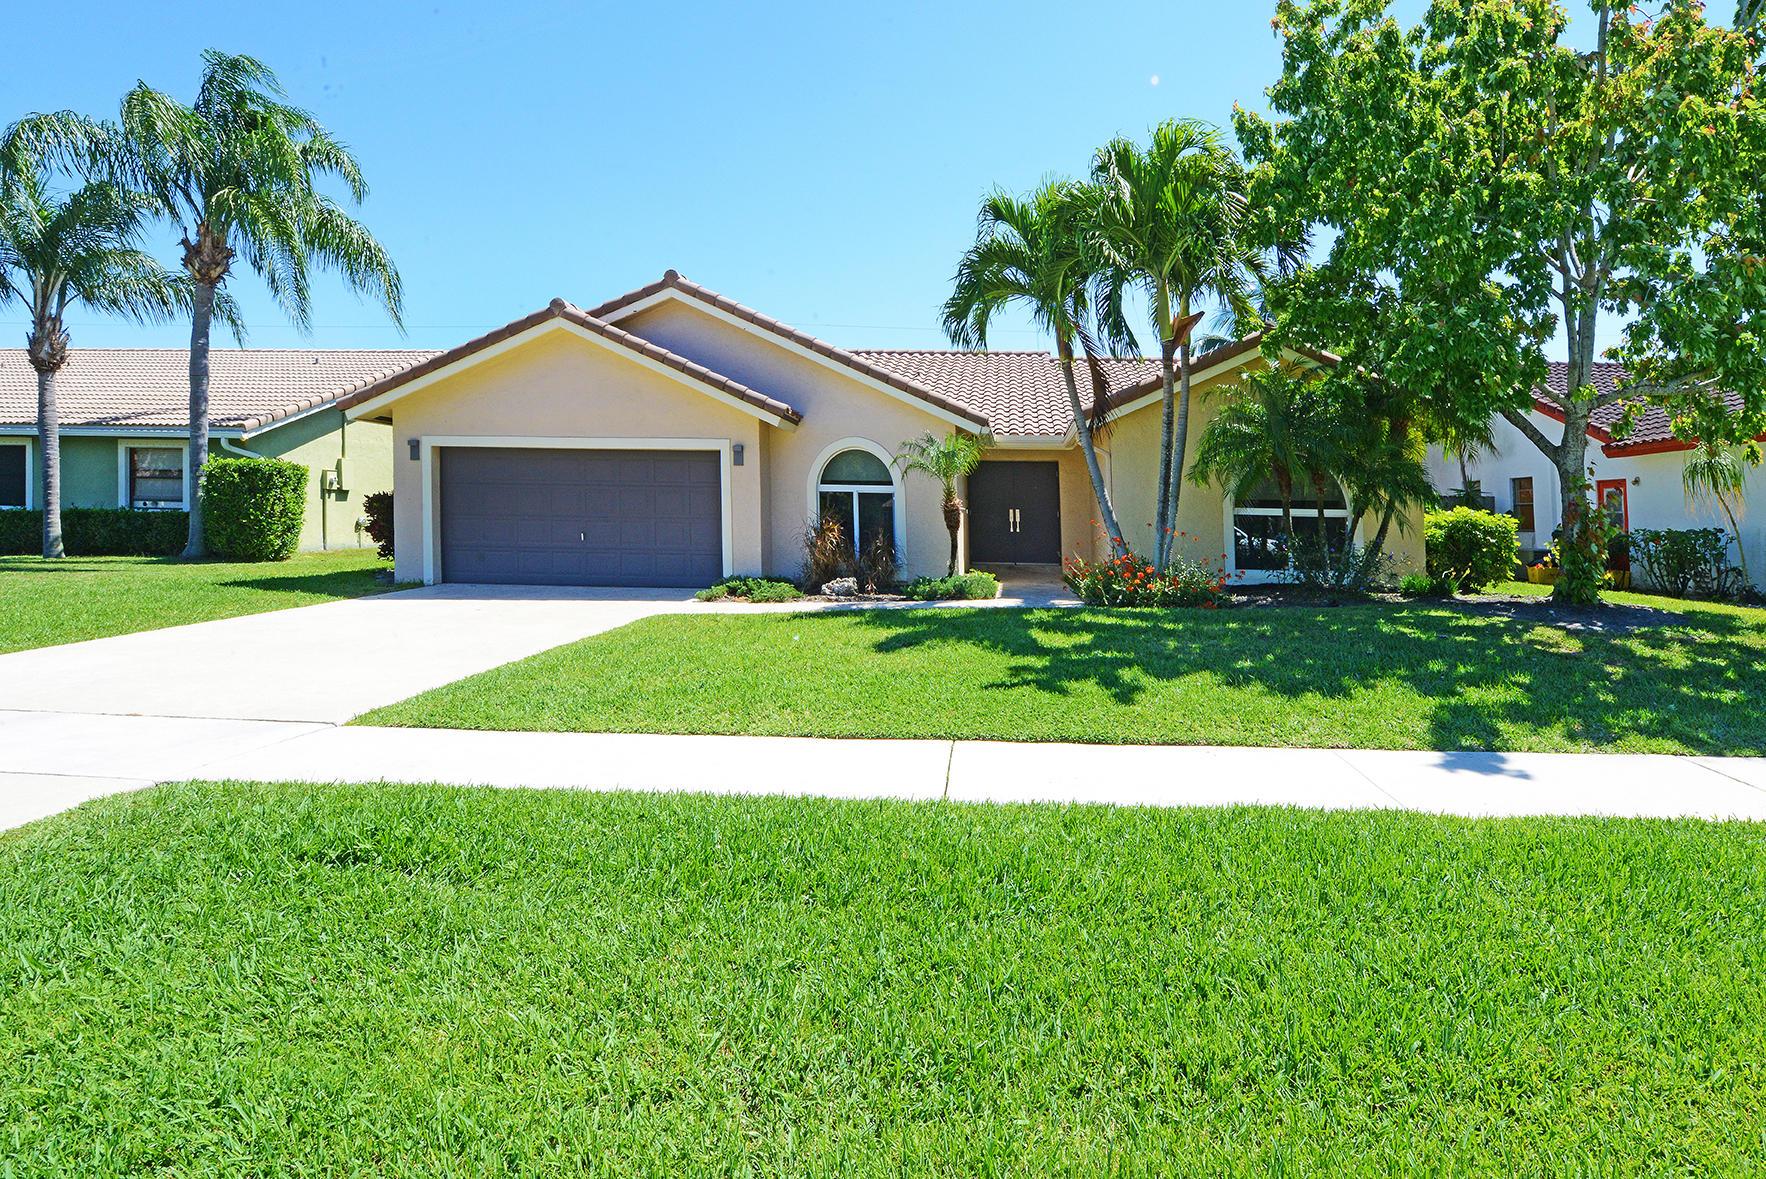 Photo of  Boca Raton, FL 33487 MLS RX-10516254